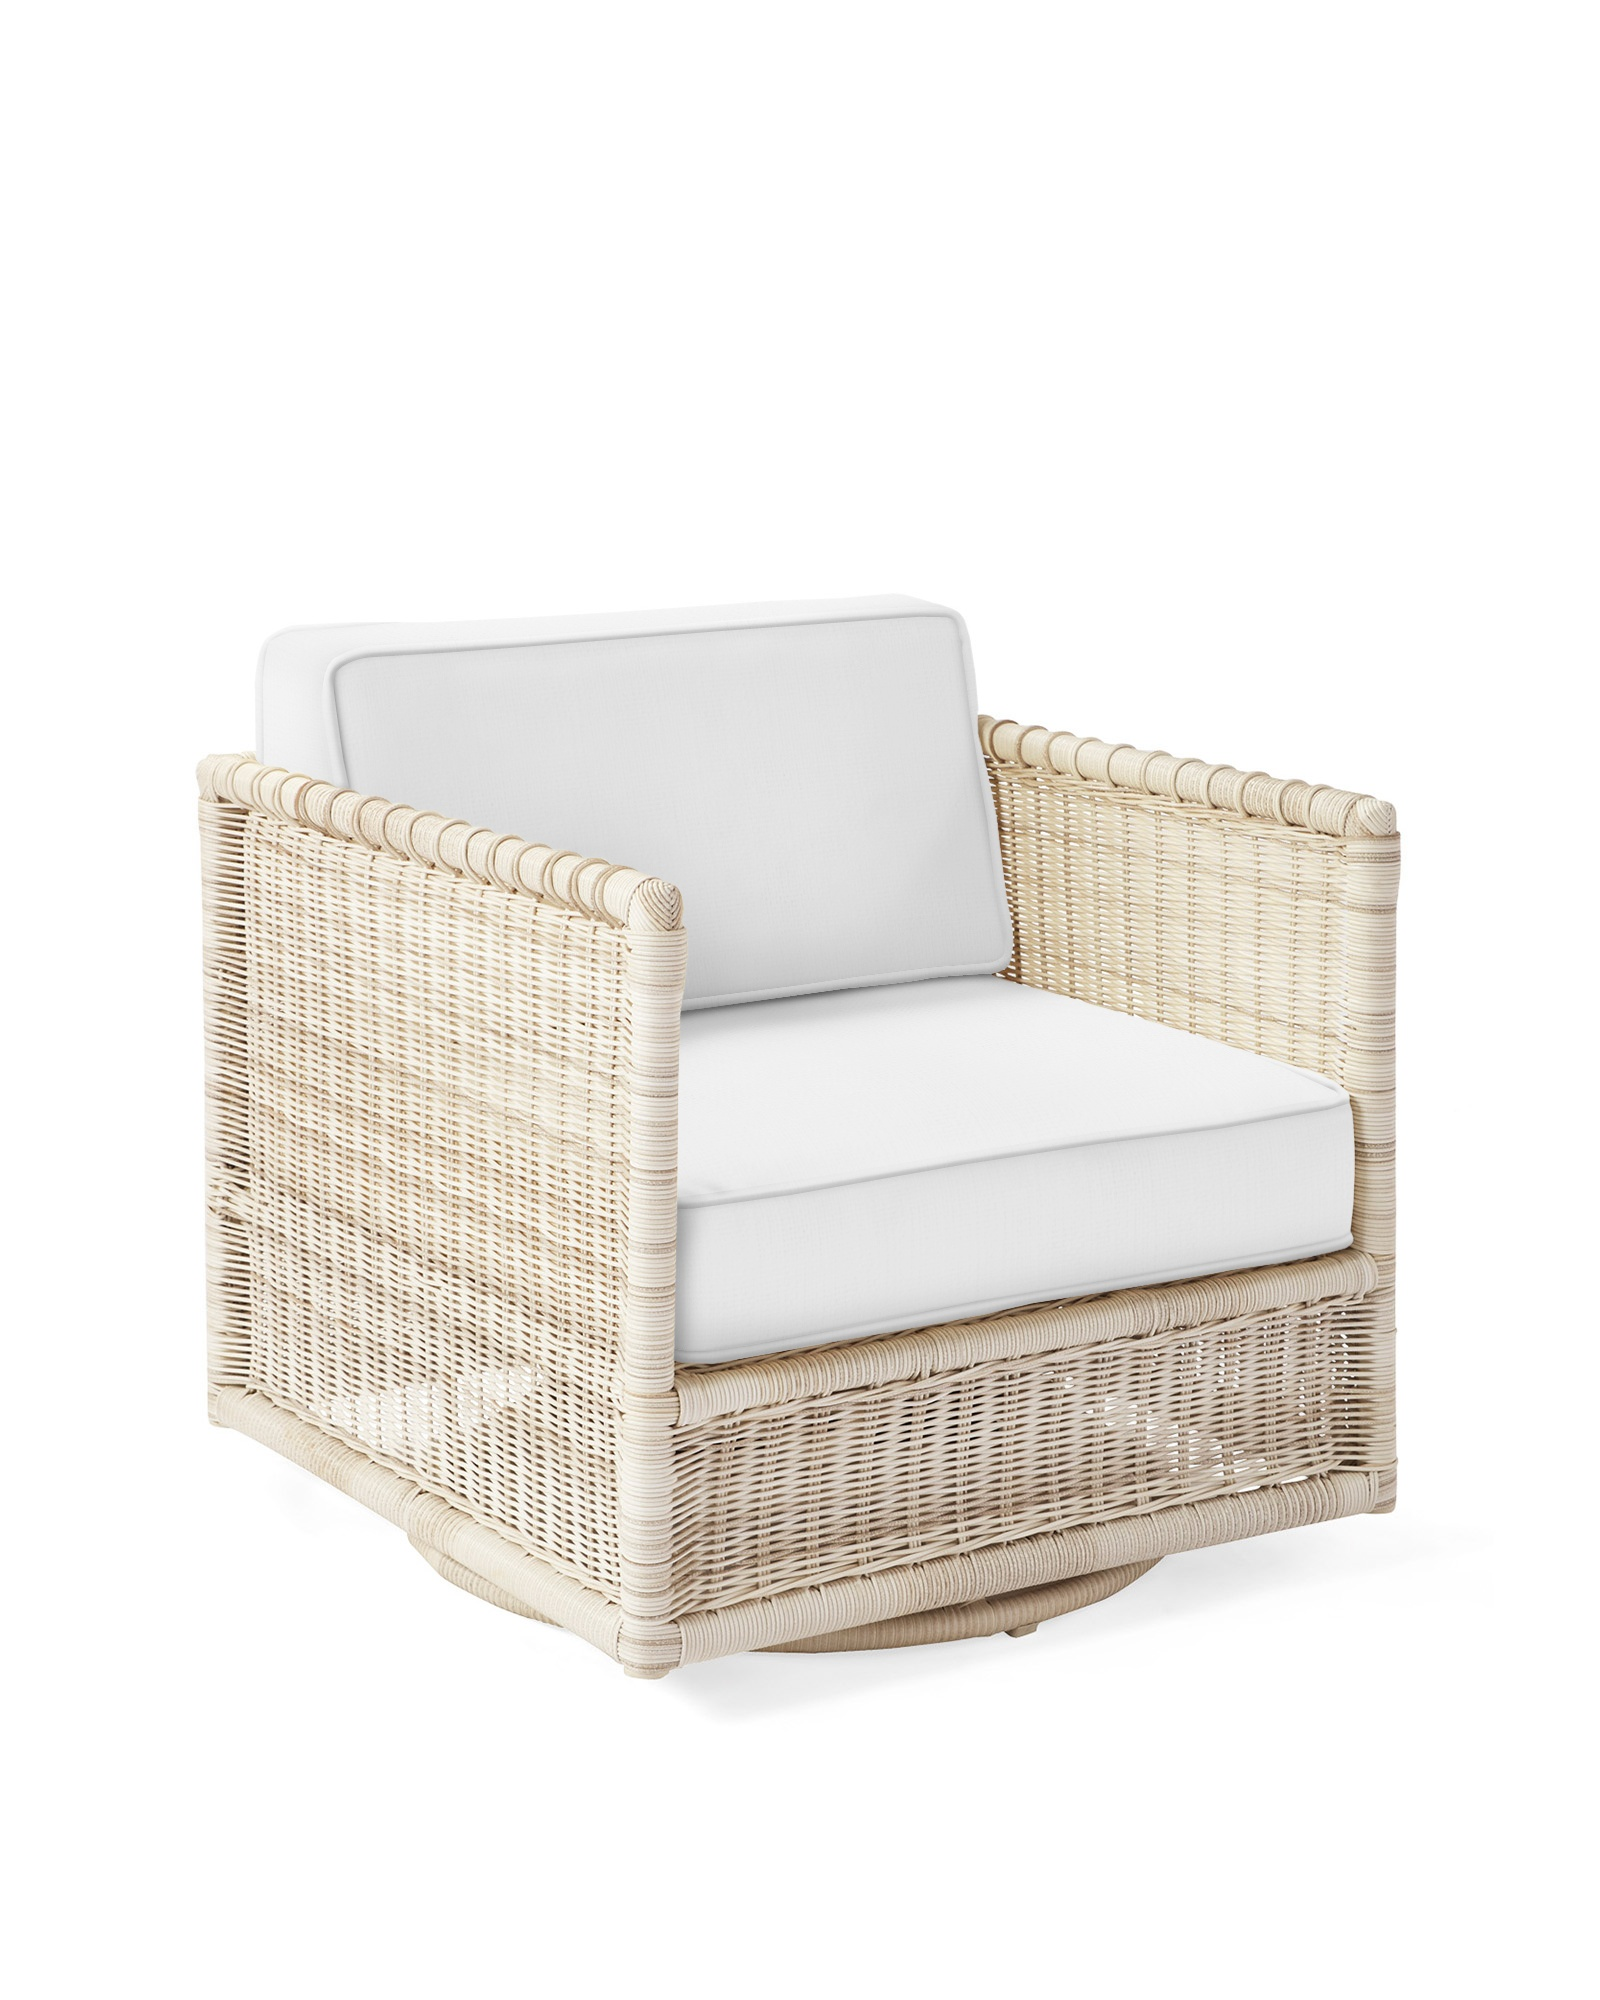 Pacifica Swivel Chair - Driftwood